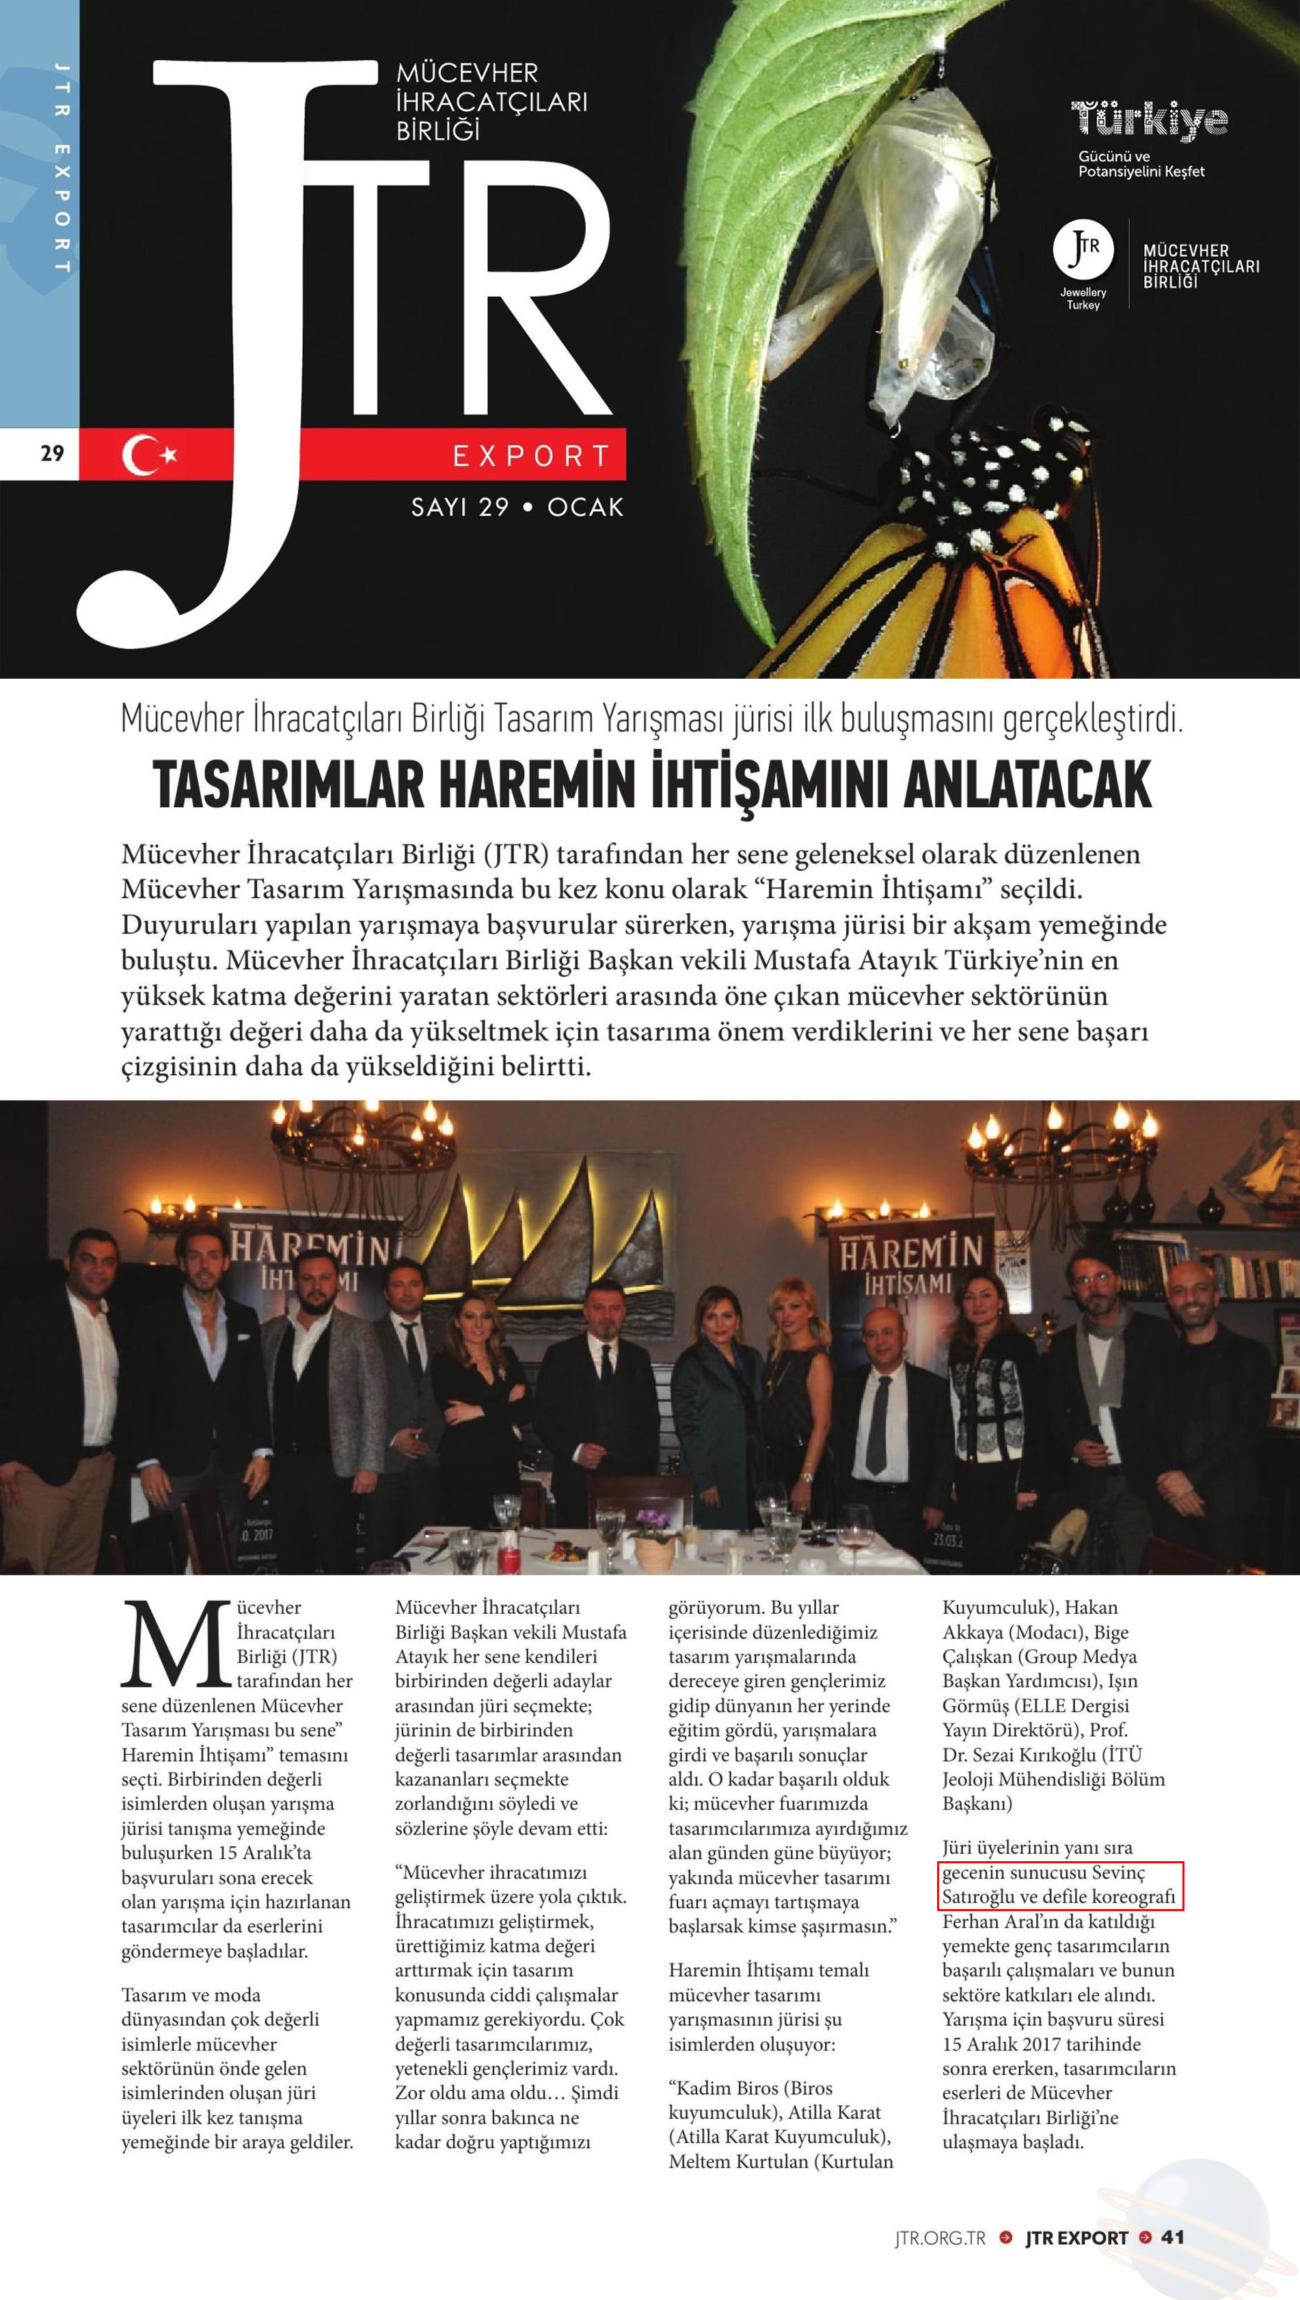 Sevinç Satıroğlu Sunucu master of ceremony 4